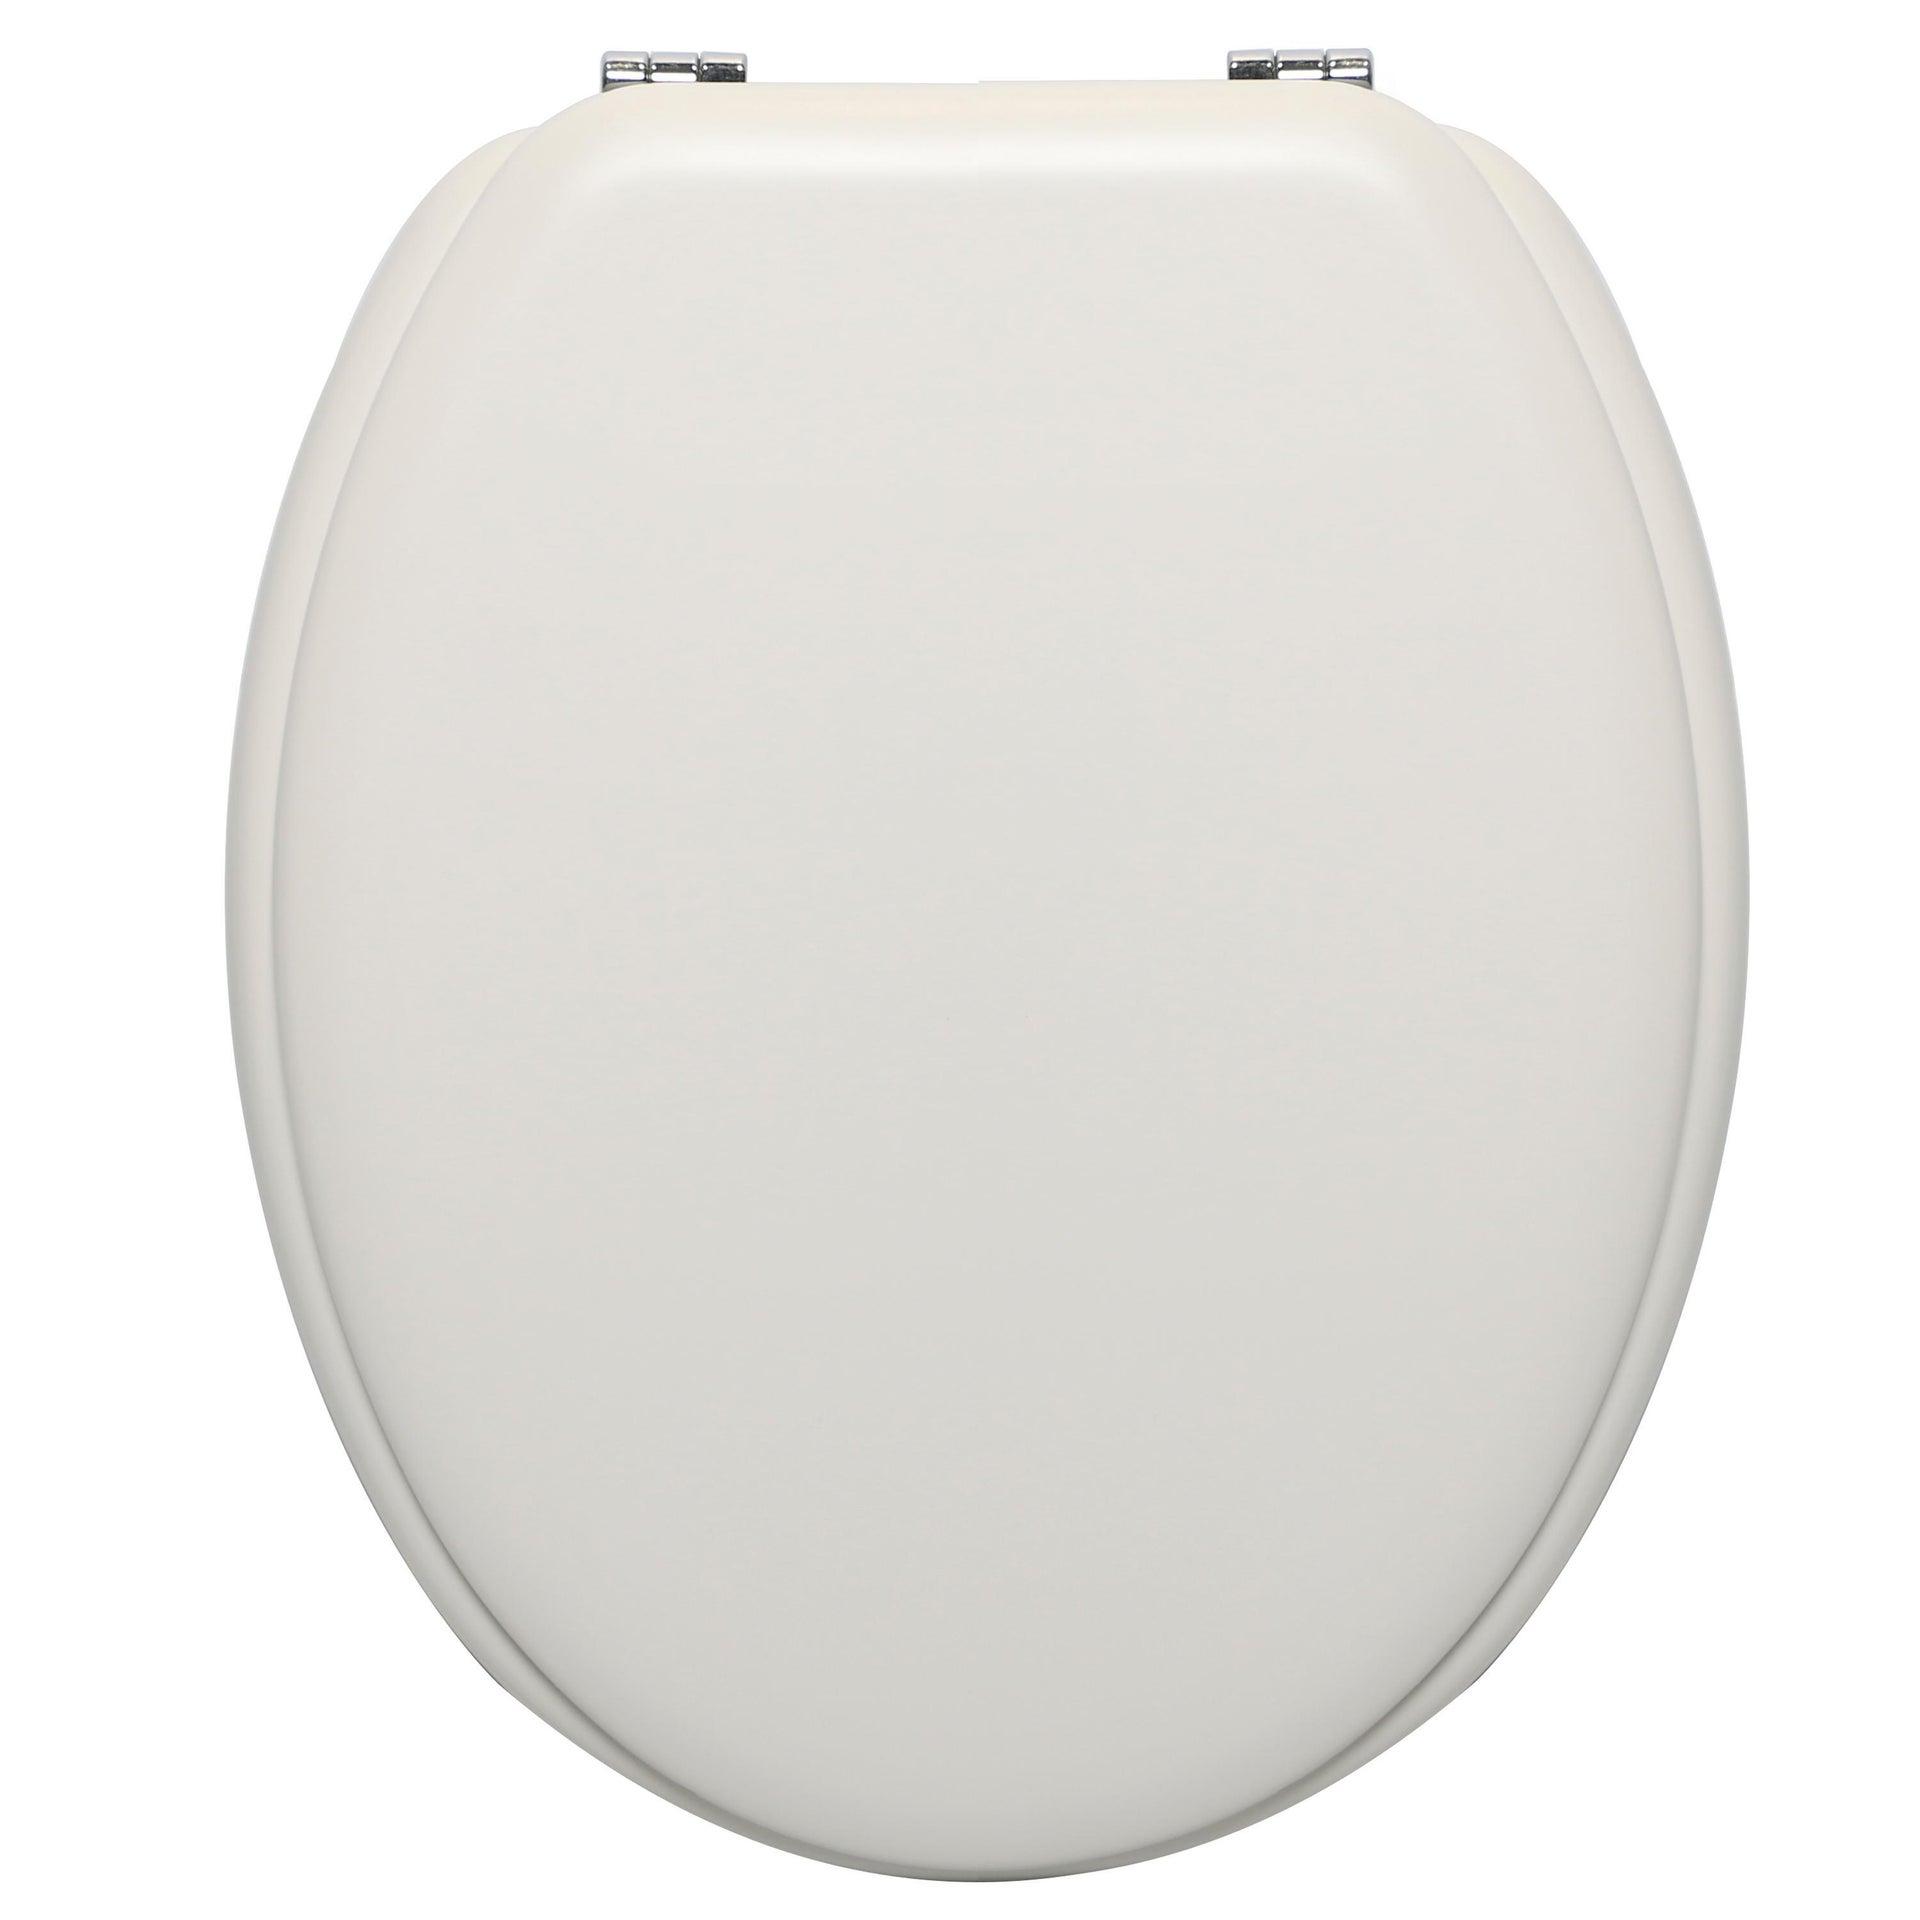 Copriwater ovale Universale Pop SENSEA mdf bianco - 1